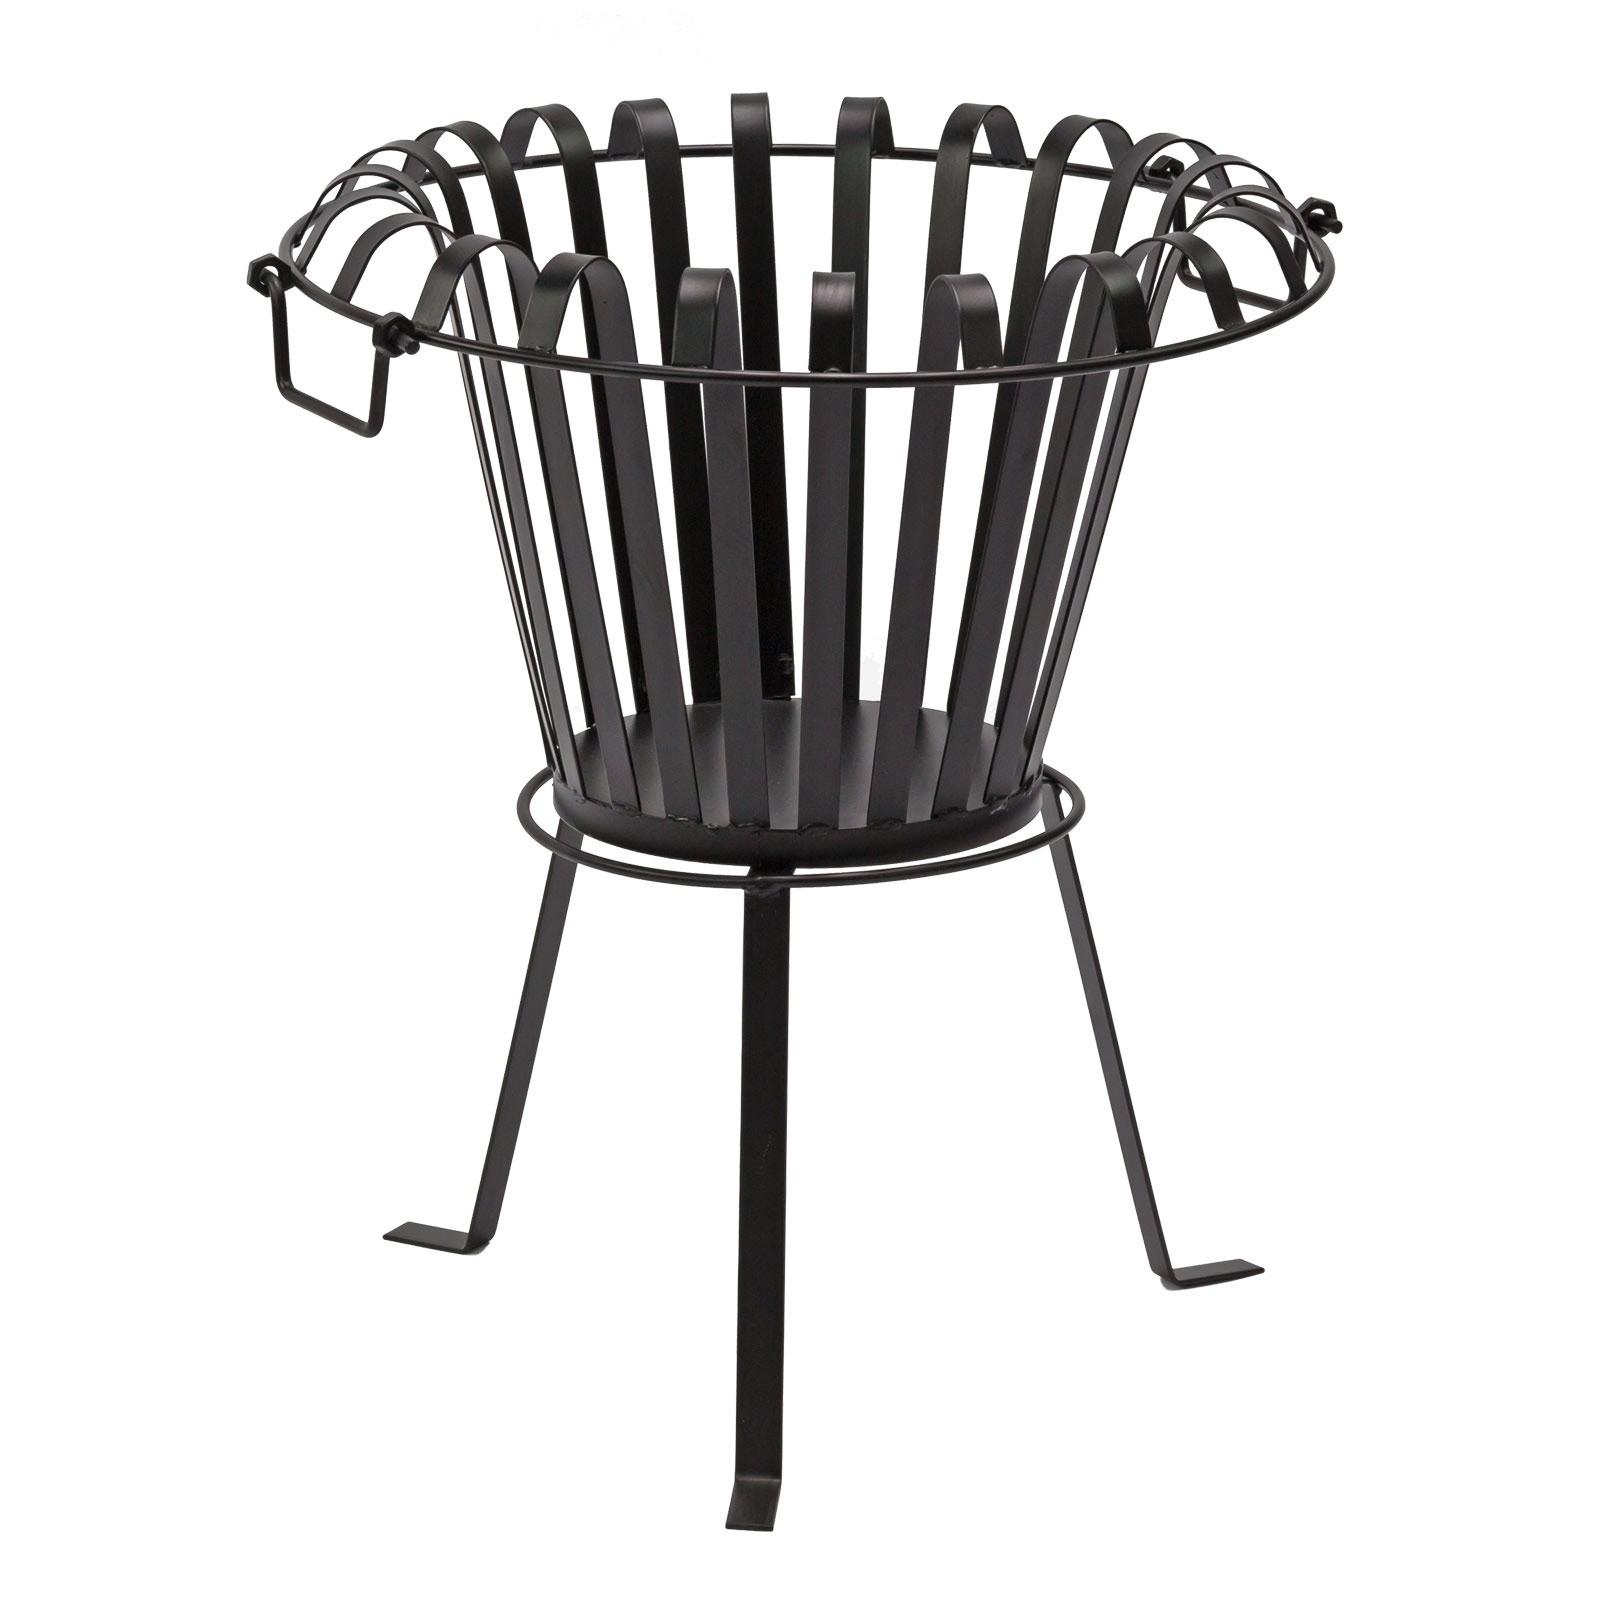 feuerkorb feuerstelle bilbao 3 kg 54 cm hoch aus metall. Black Bedroom Furniture Sets. Home Design Ideas